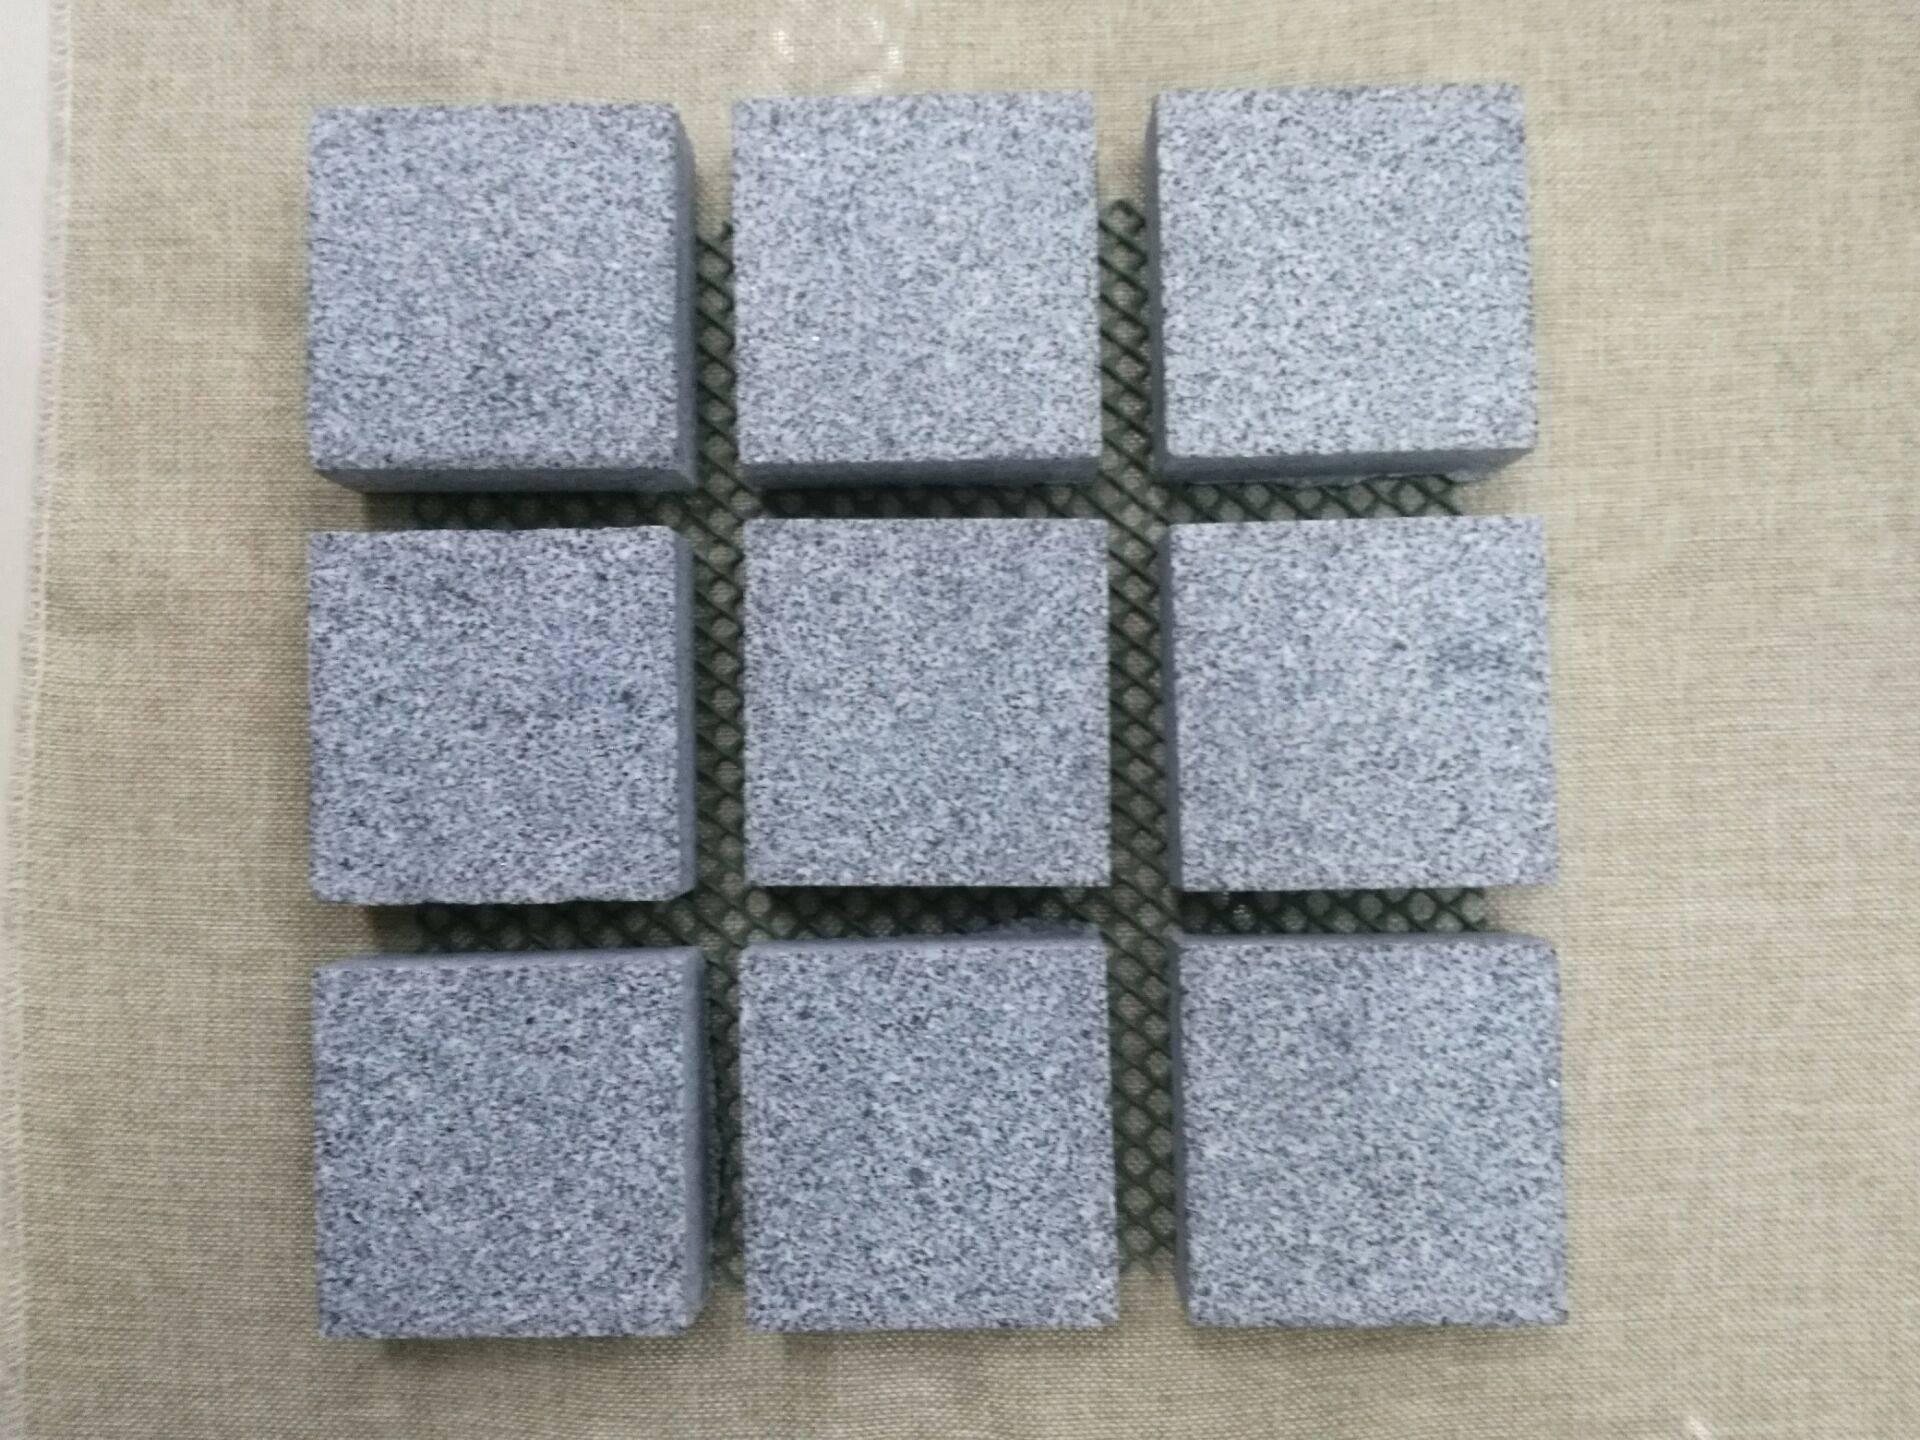 Grey Mesh Paving stone